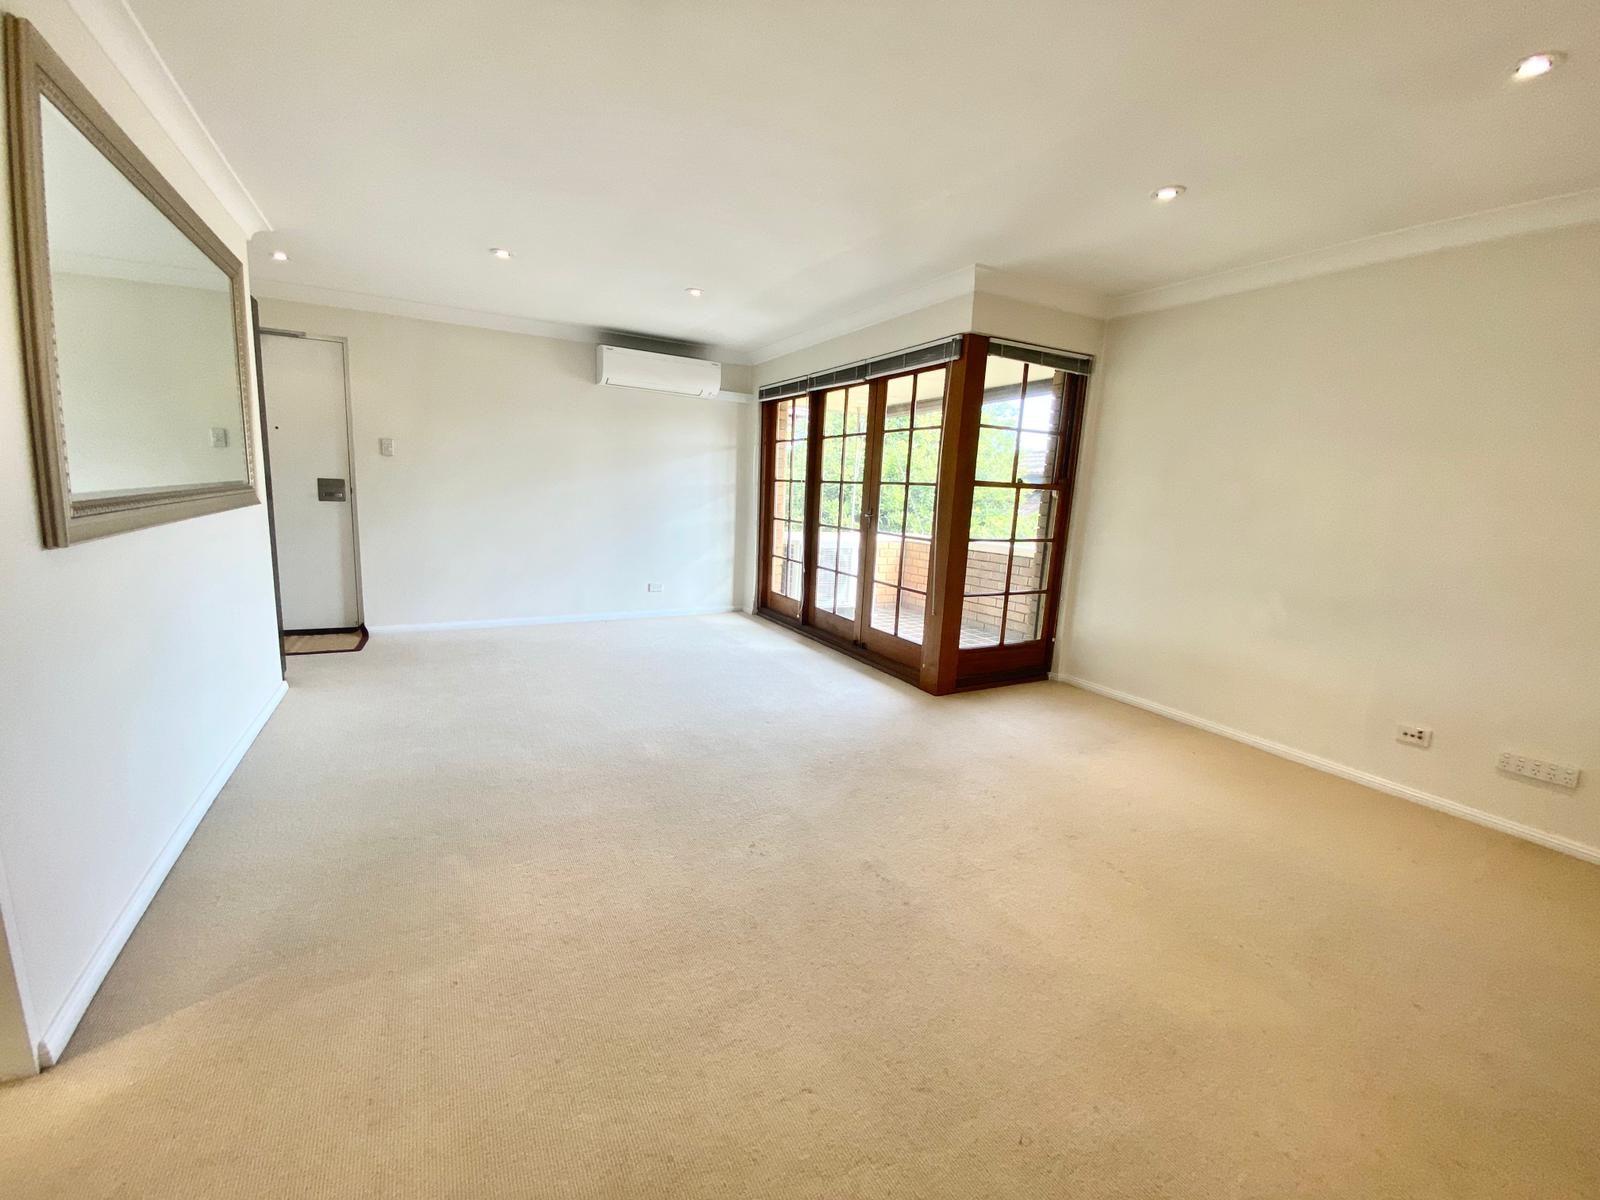 3/111 Wellbank Street, North Strathfield NSW 2137